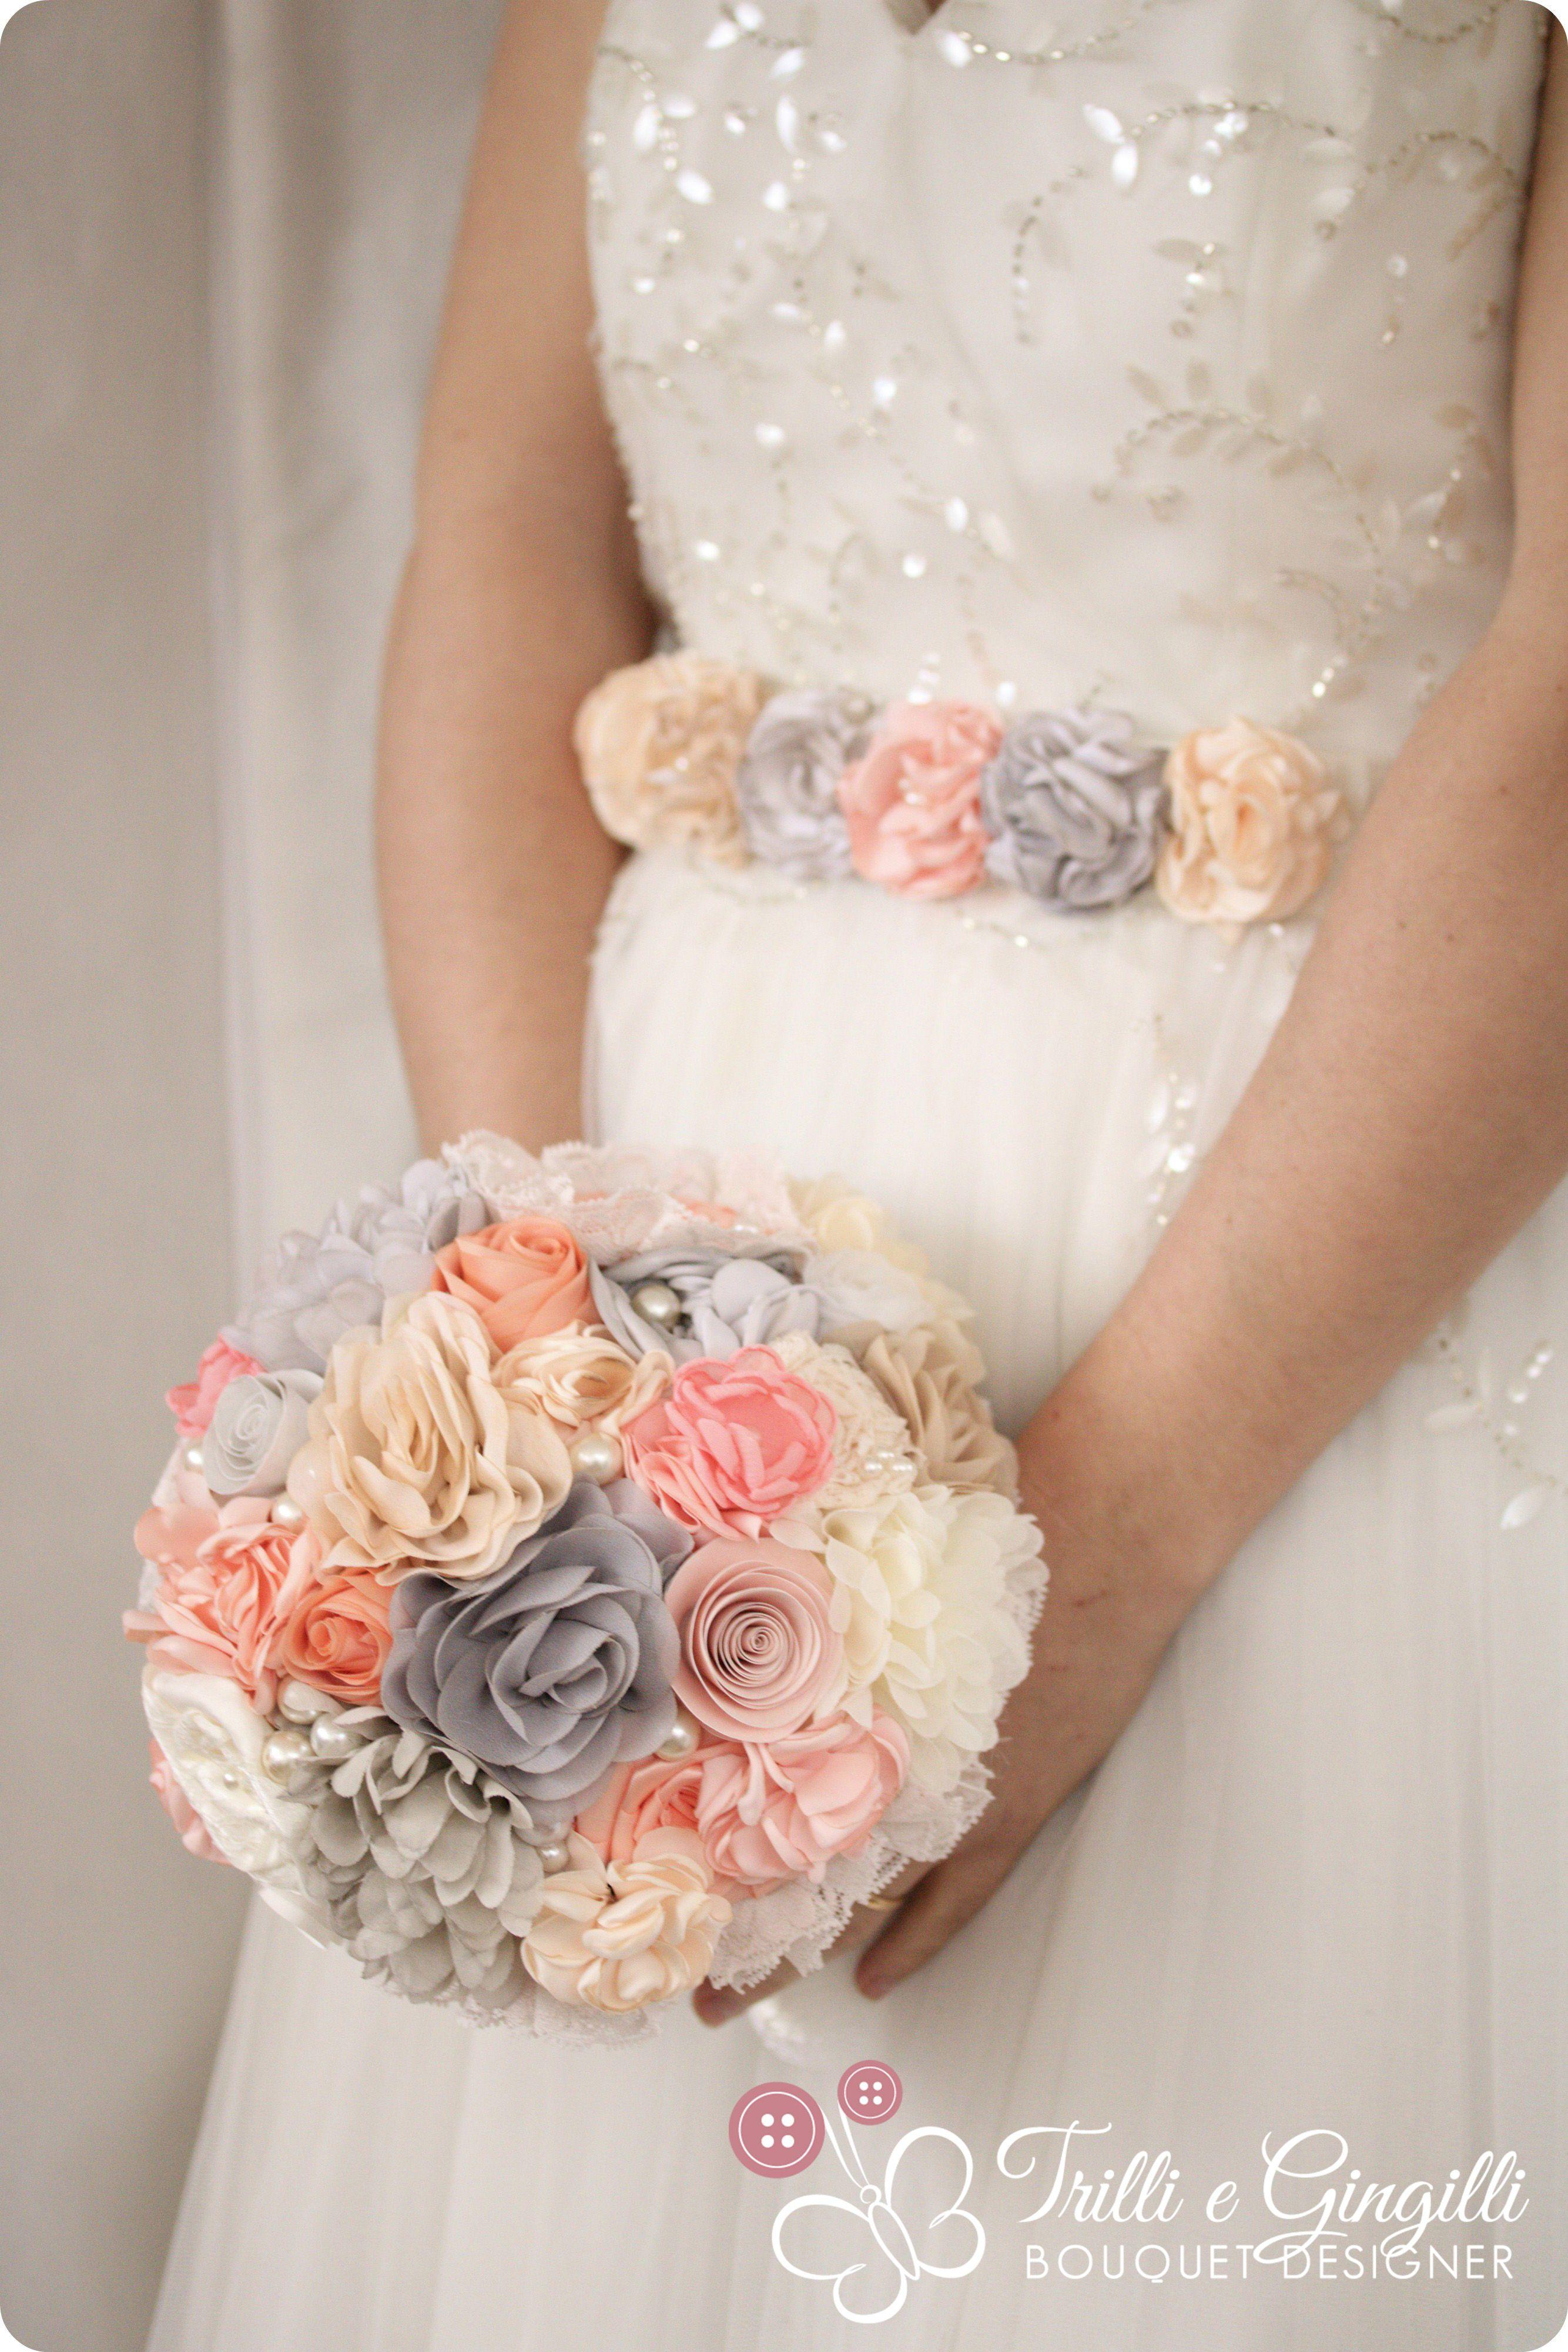 Bouquet Sposa Per Abito Avorio.Fabric Bouquet With A Coordinated Belt For The Bride Bouquet Di